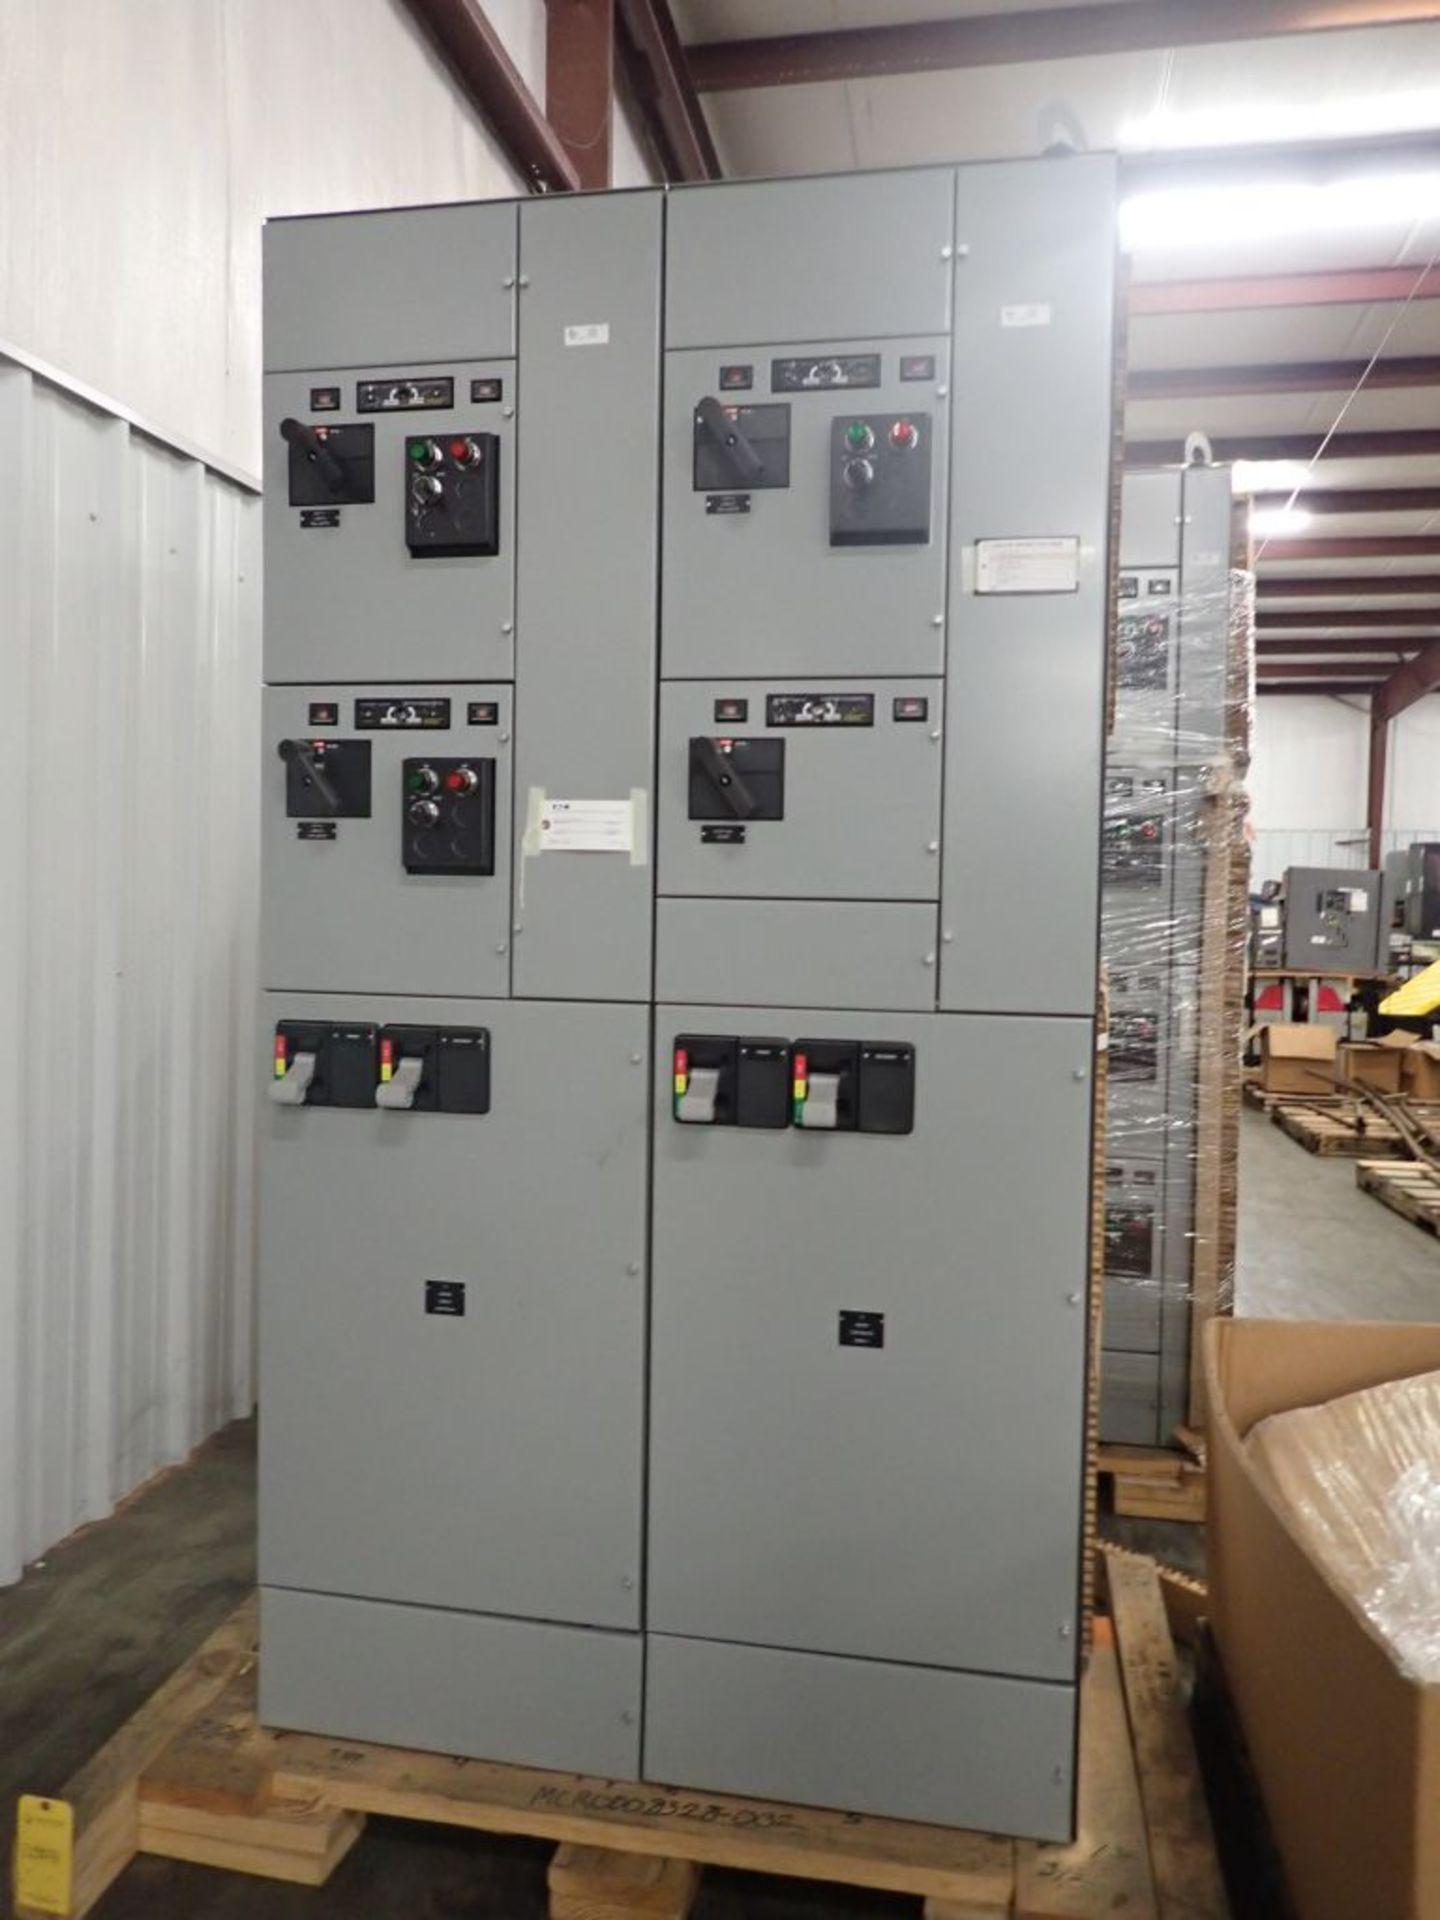 Eaton Freedom 2100 Series Motor Control Center | (2) F208-30A; (1) F208-40A; (1) FDRB-50A; (2)